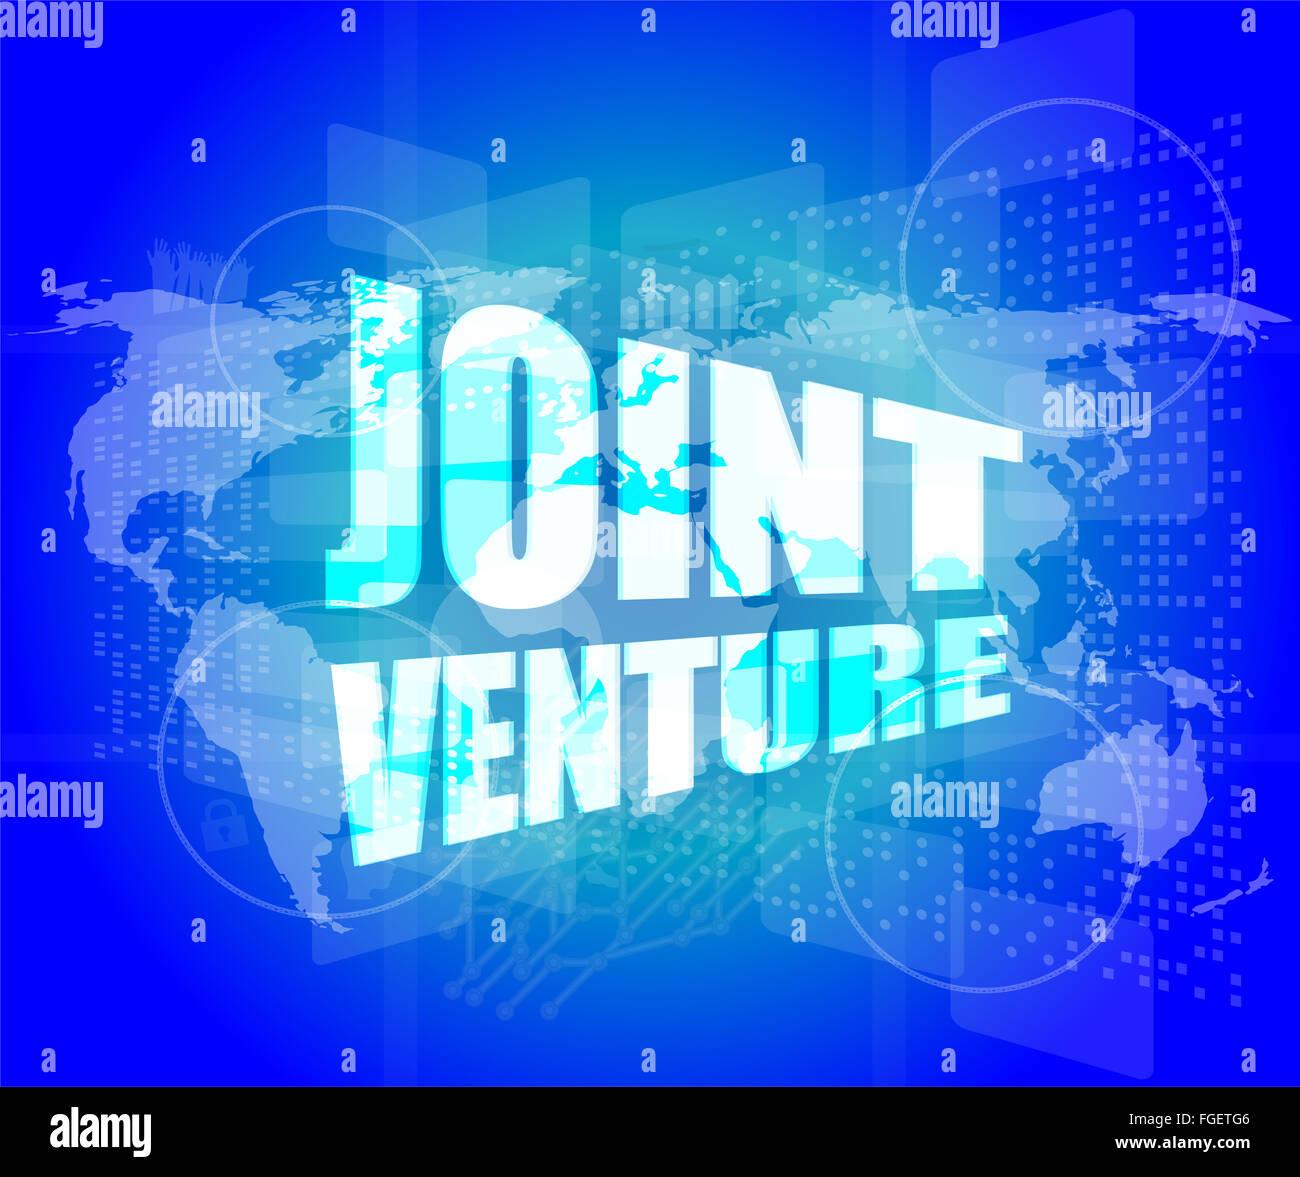 Joint venture words on digital screen background with world map joint venture words on digital screen background with world map gumiabroncs Choice Image